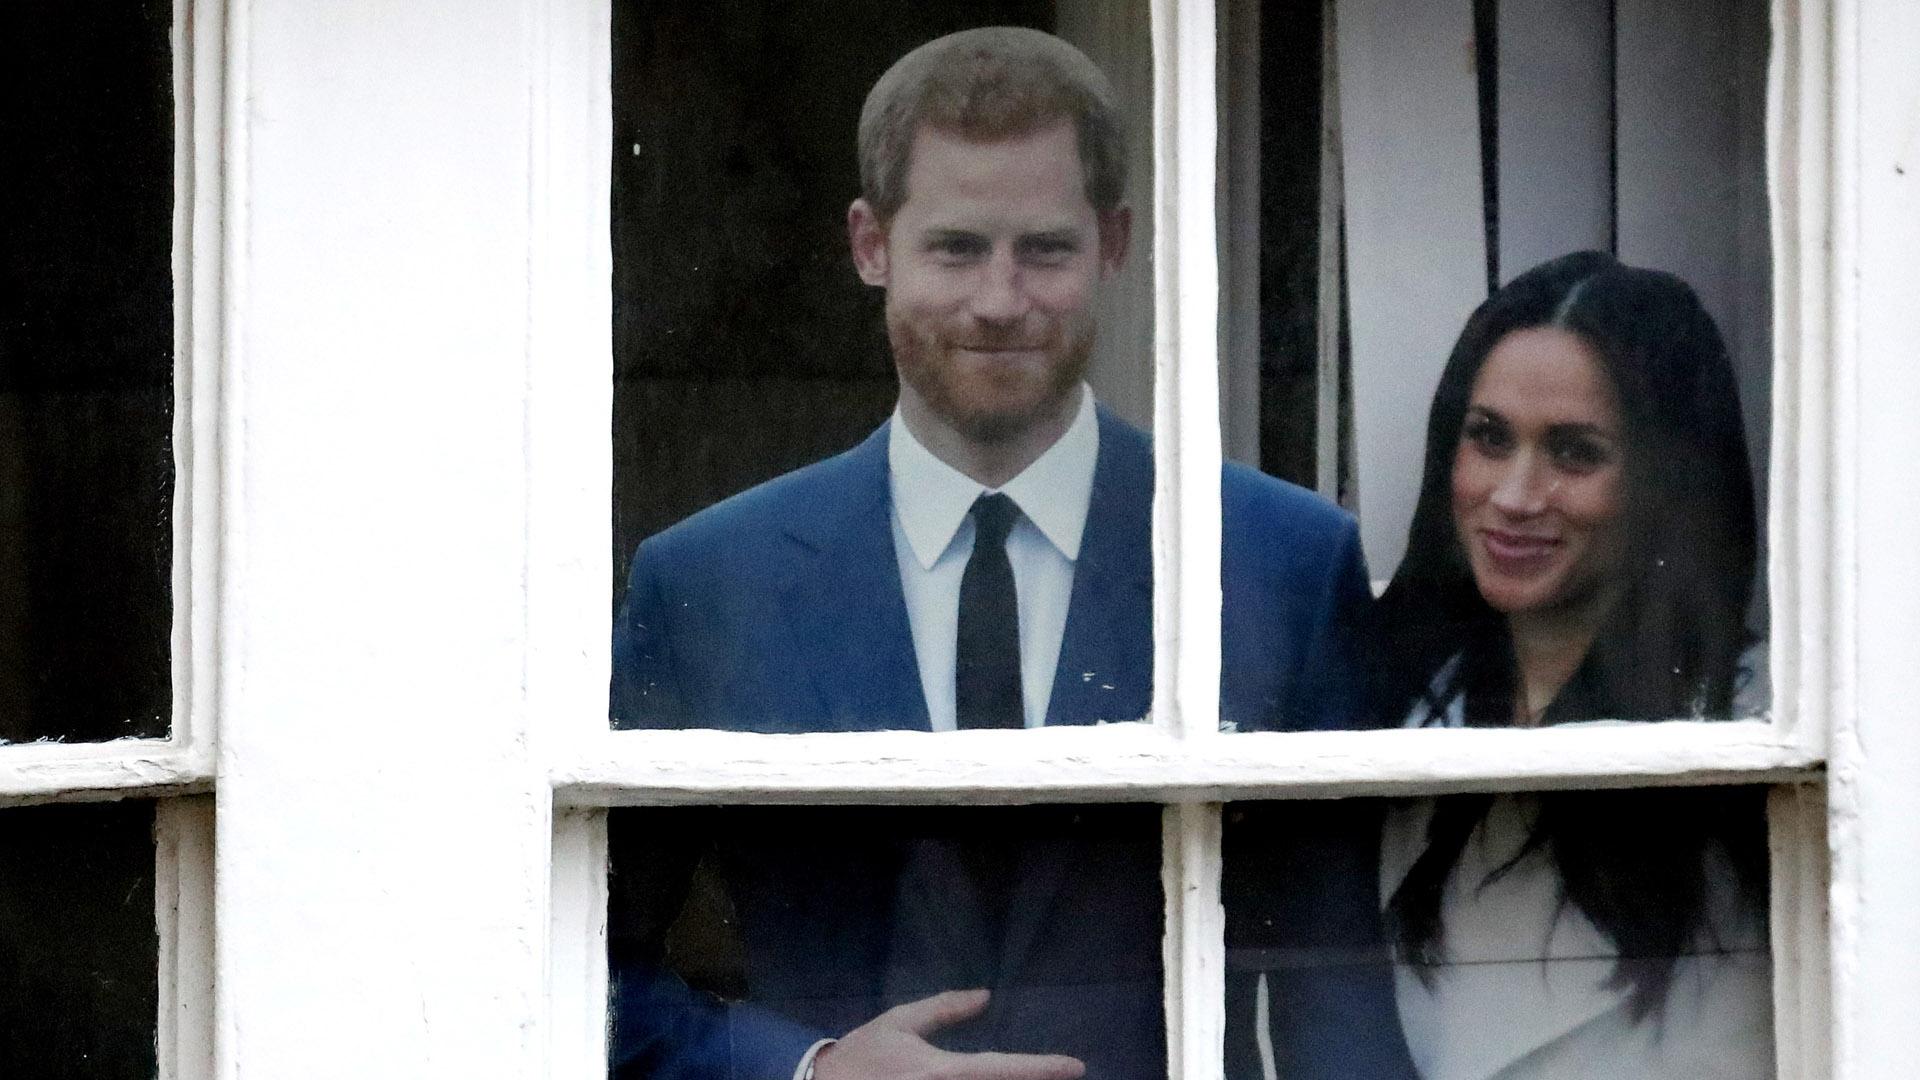 Príncipe Harry llega a Canadá para reencontrarse con Meghan Markle